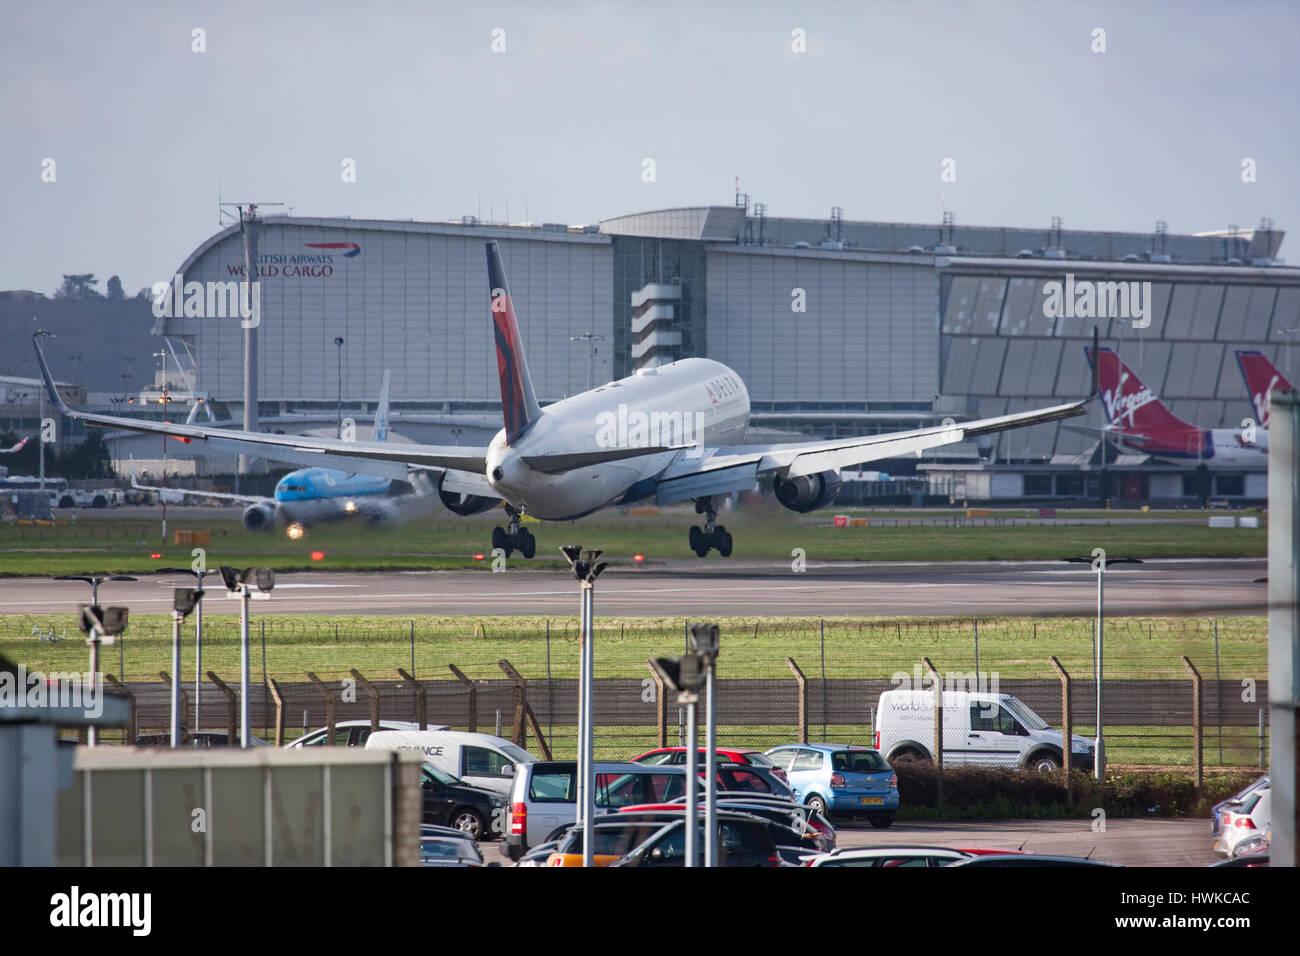 Delta Air Lines Boeing 767-332/ER landing at London Heathrow Airport, UK - Stock Image